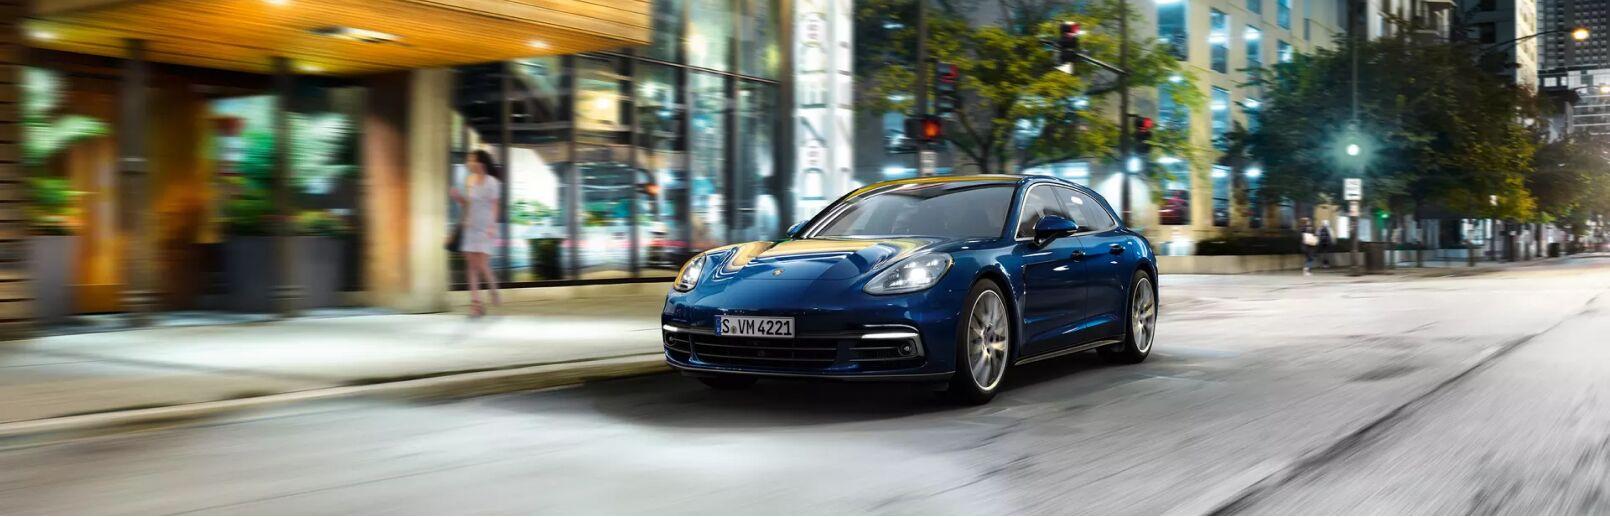 Loeber Porsche is a new and used Porsche dealership near Golf, IL